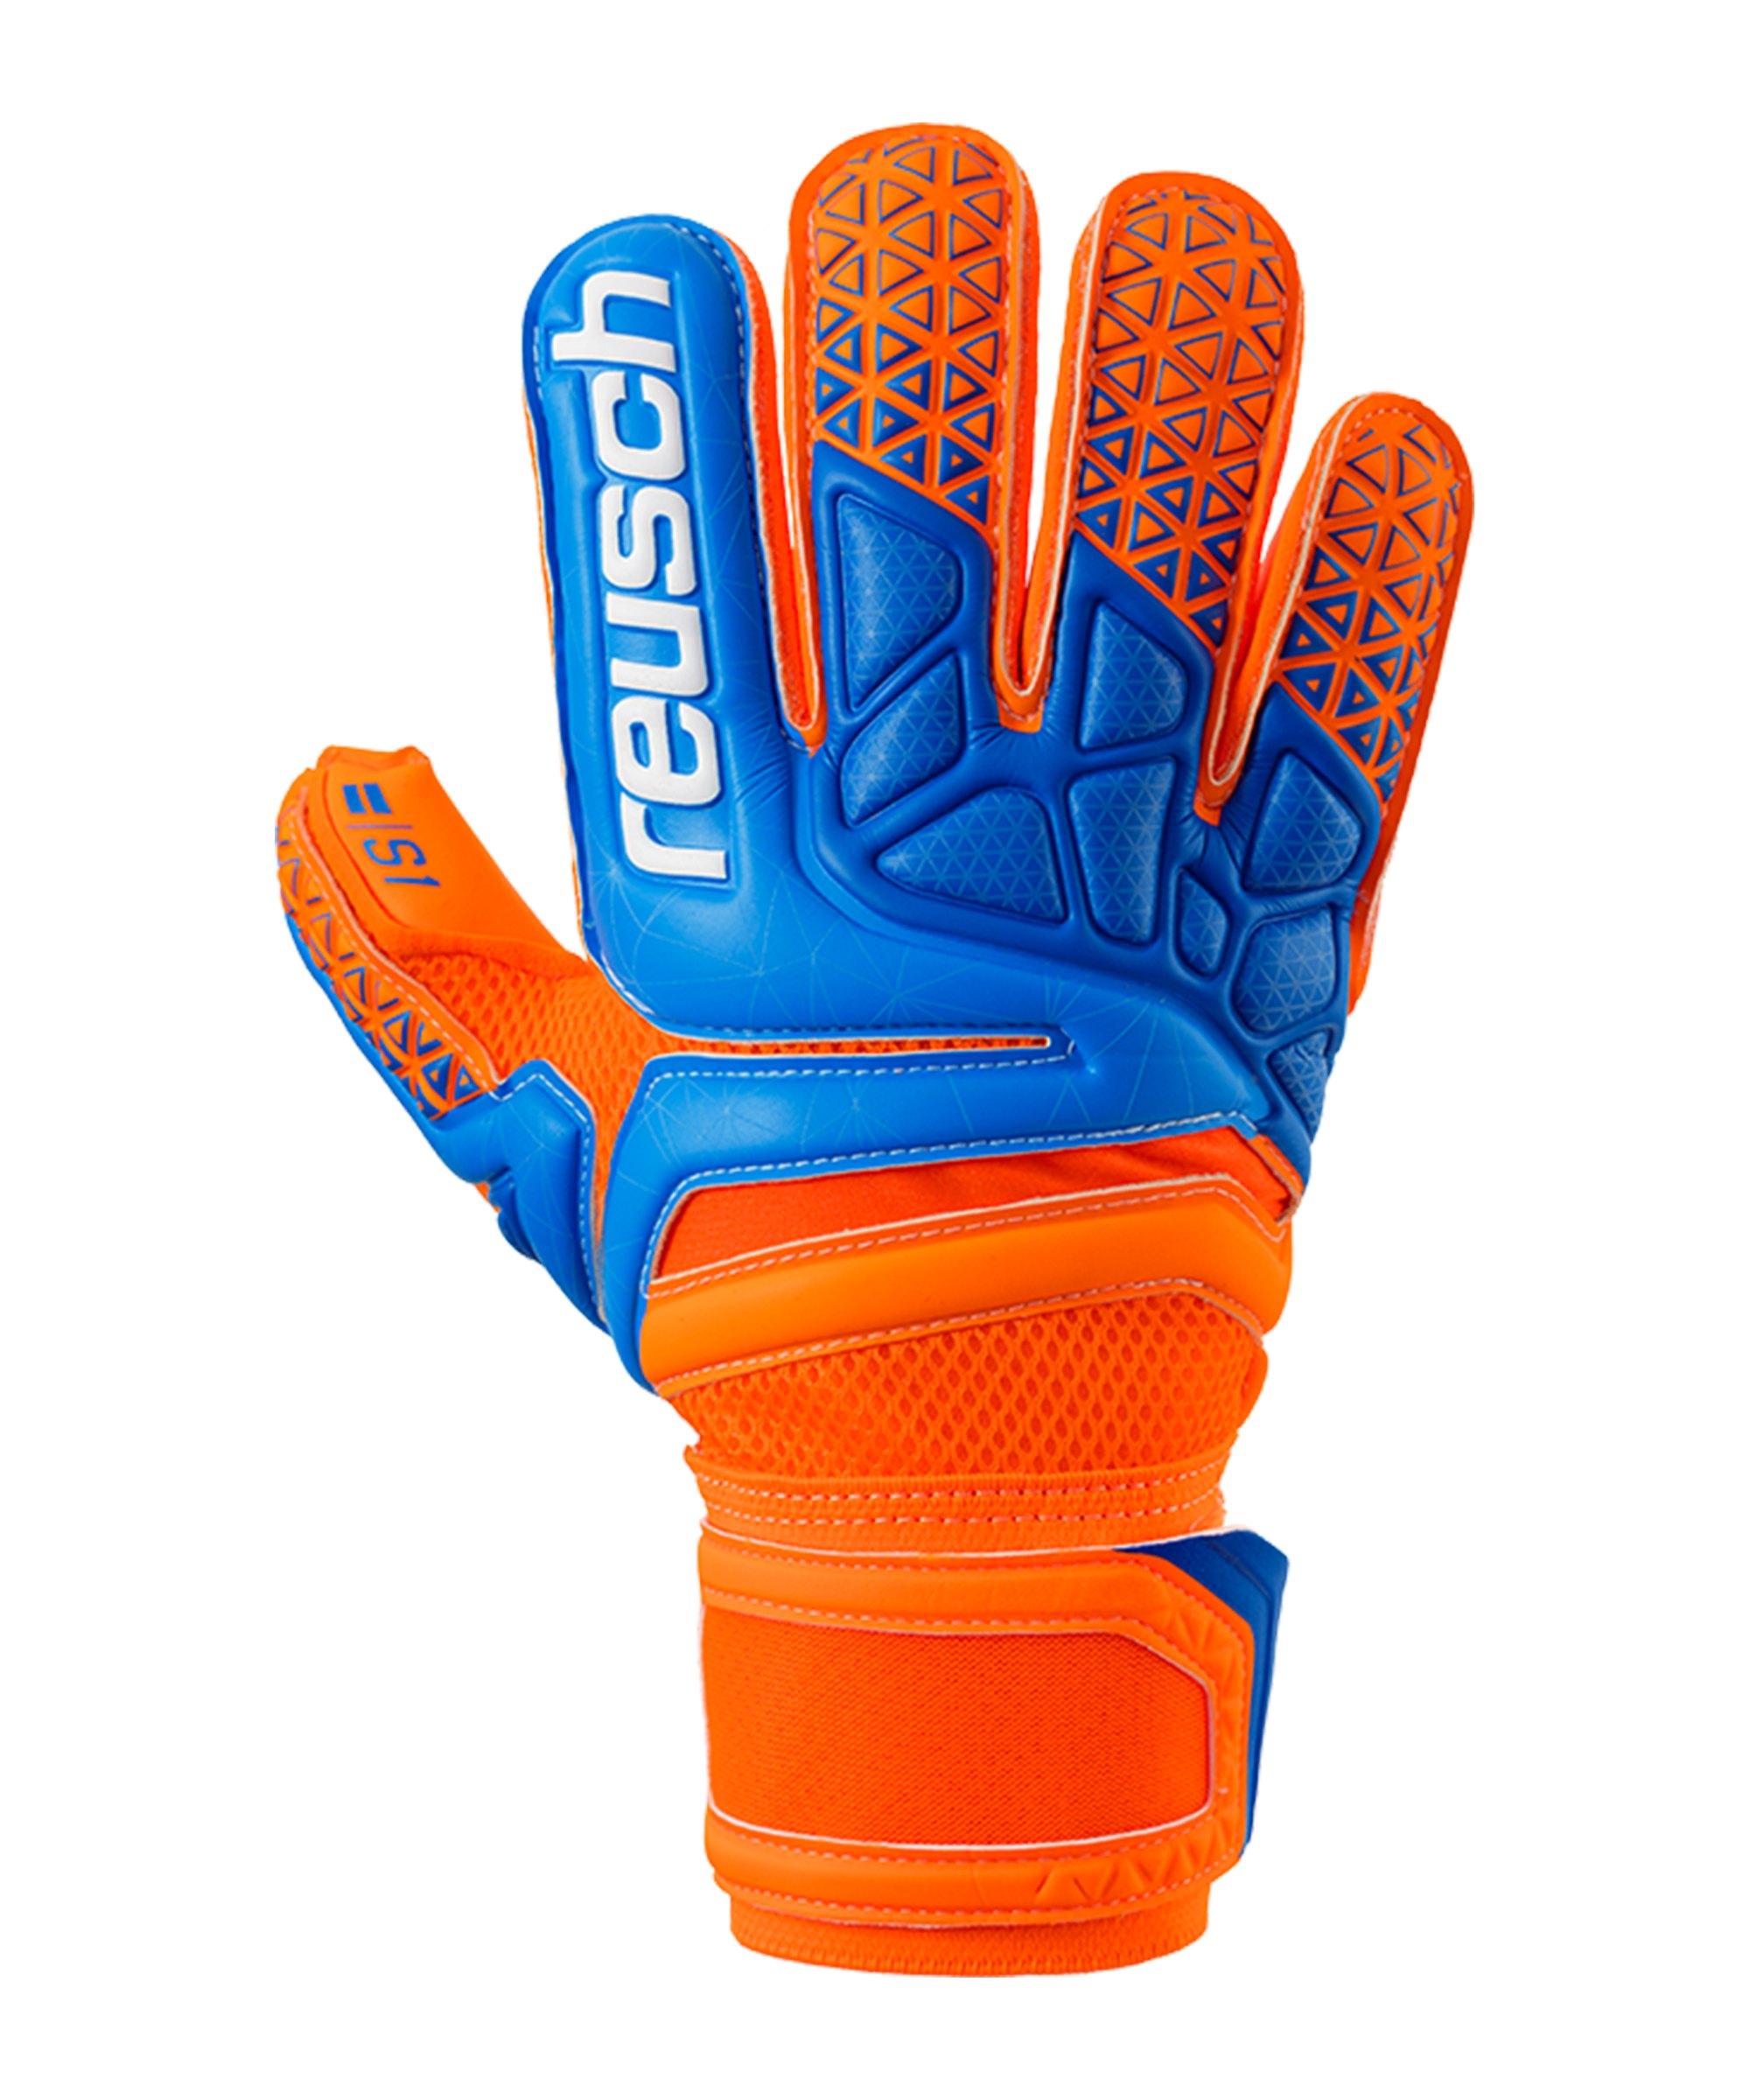 Reusch Prisma Prime S1 RF TW-Handschuh Orange F296 - orange